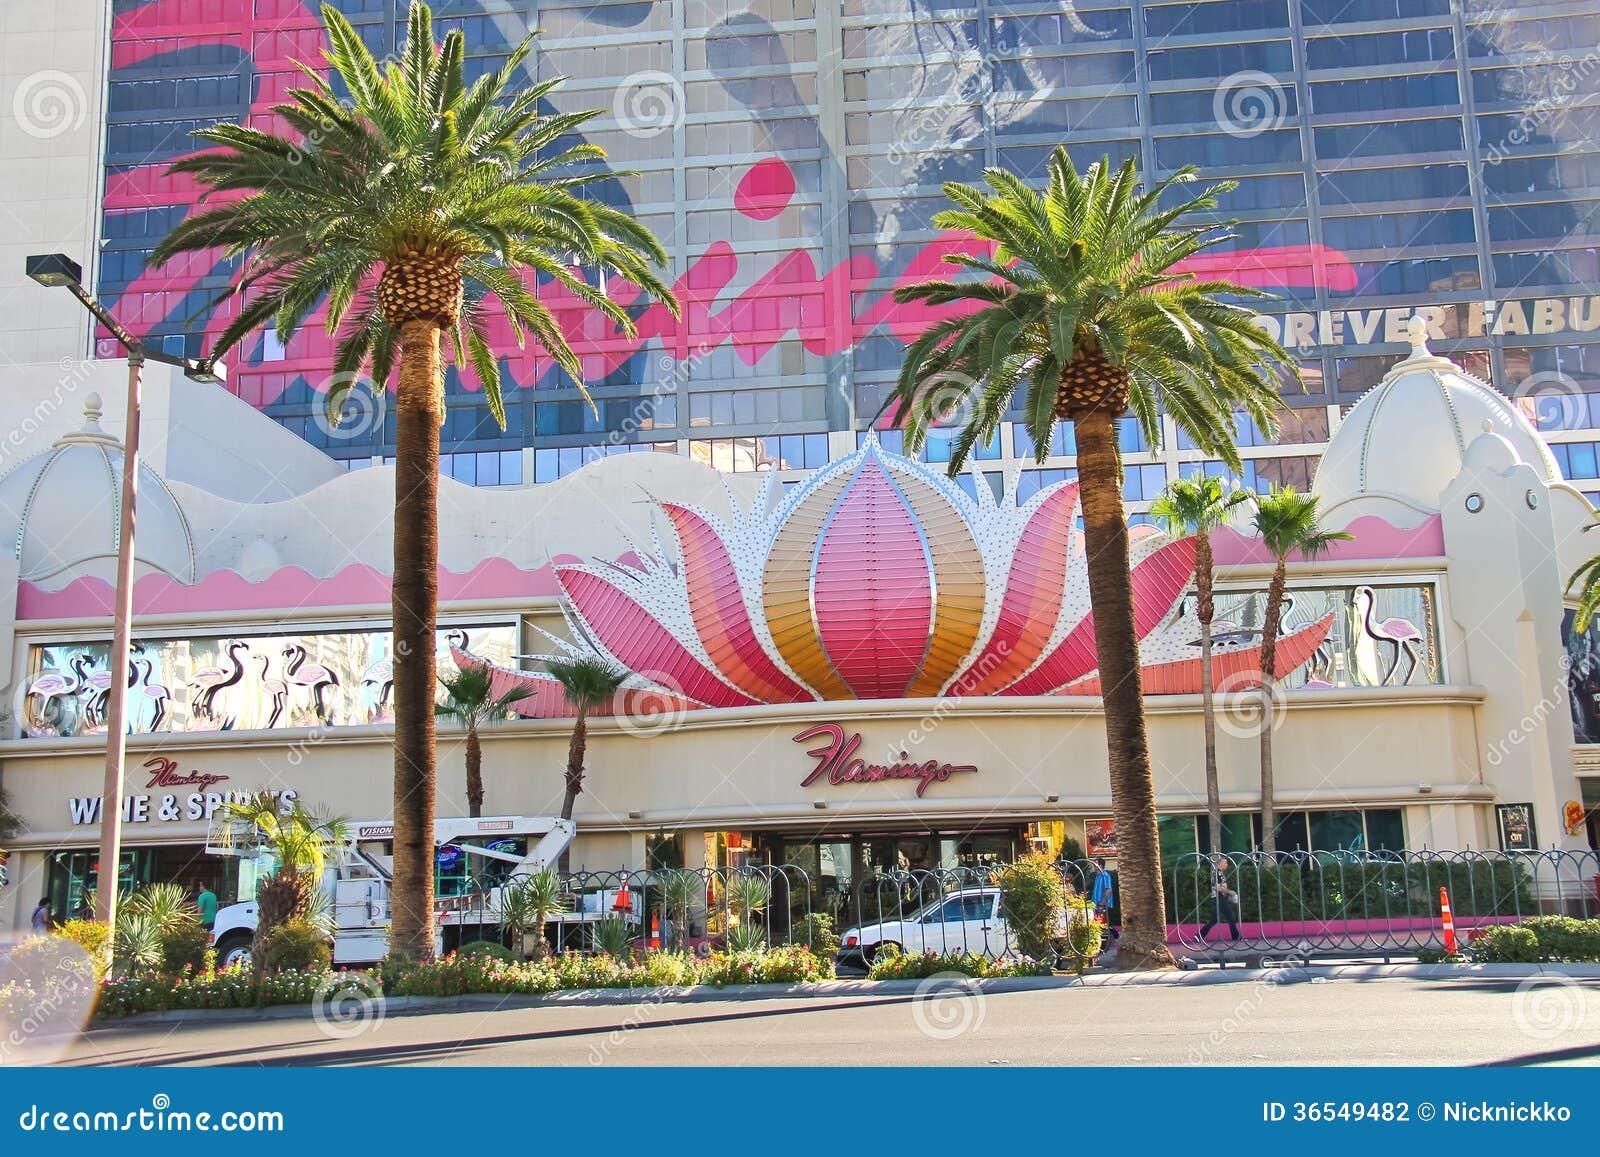 Flamingo casino las vegas nevada jupiter casino accommodation